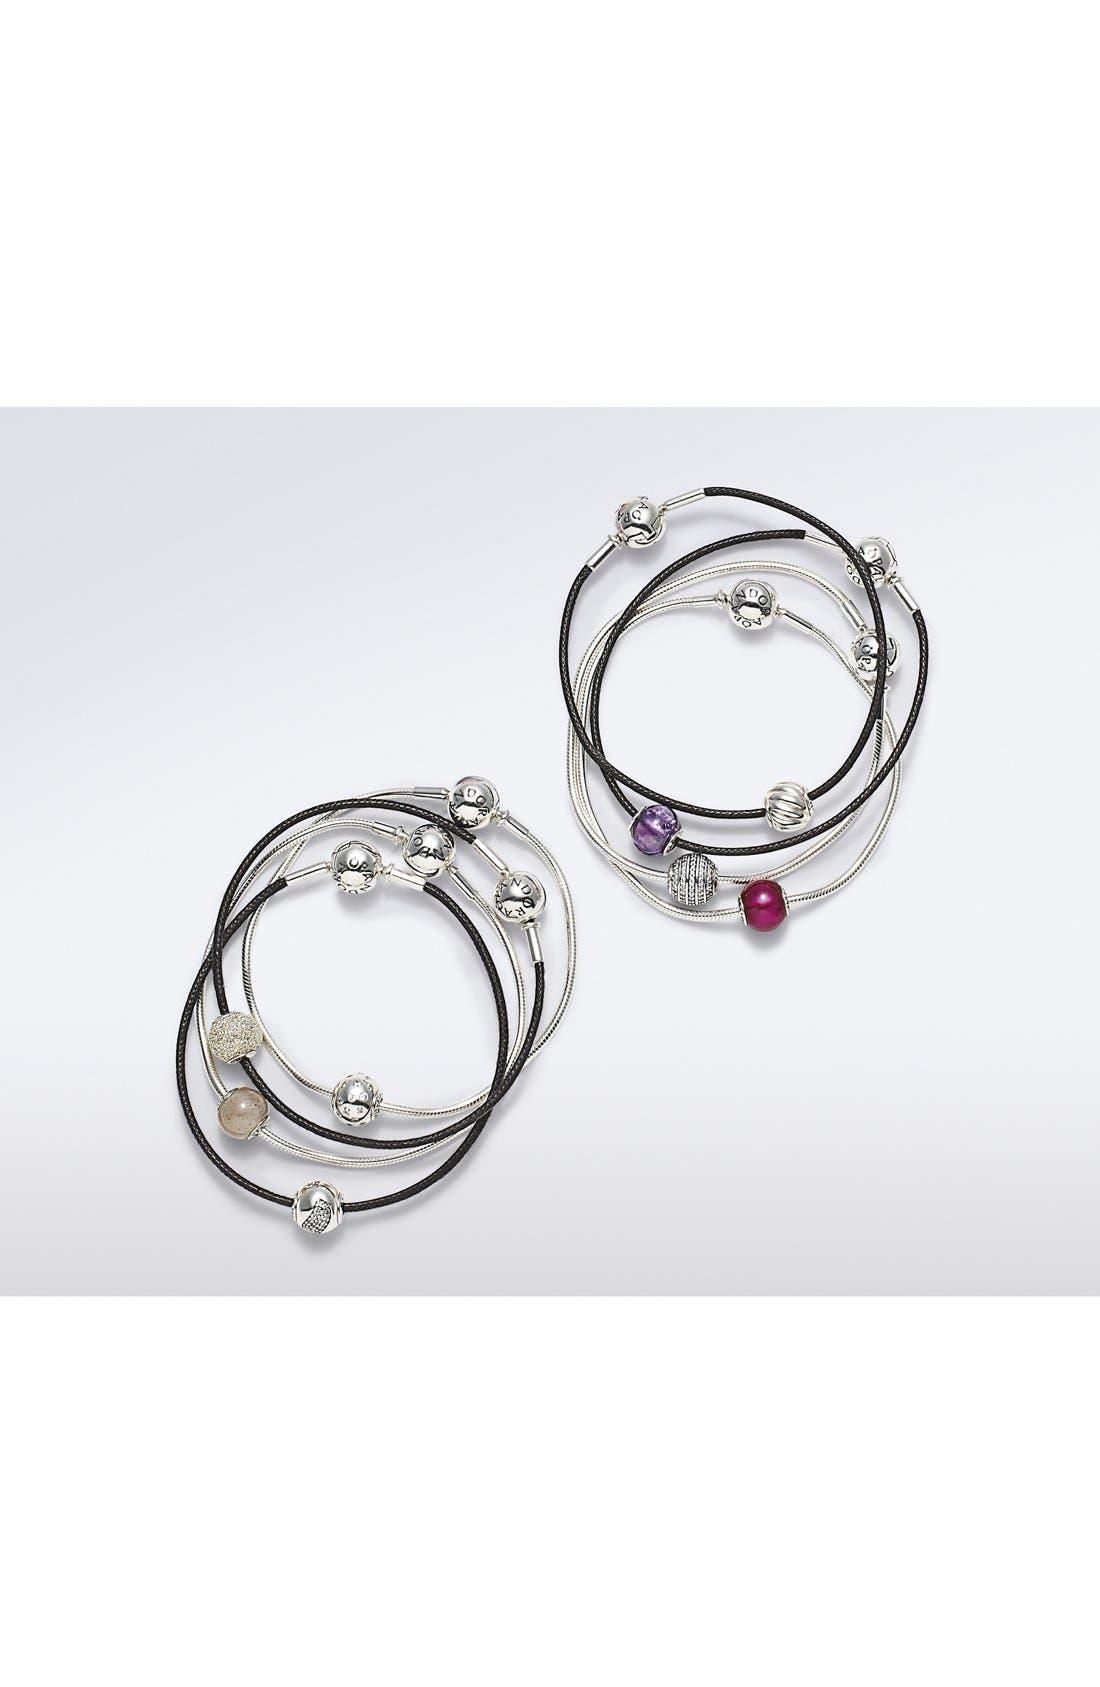 'Essence - Love' Charm Bracelet Set,                             Alternate thumbnail 3, color,                             040